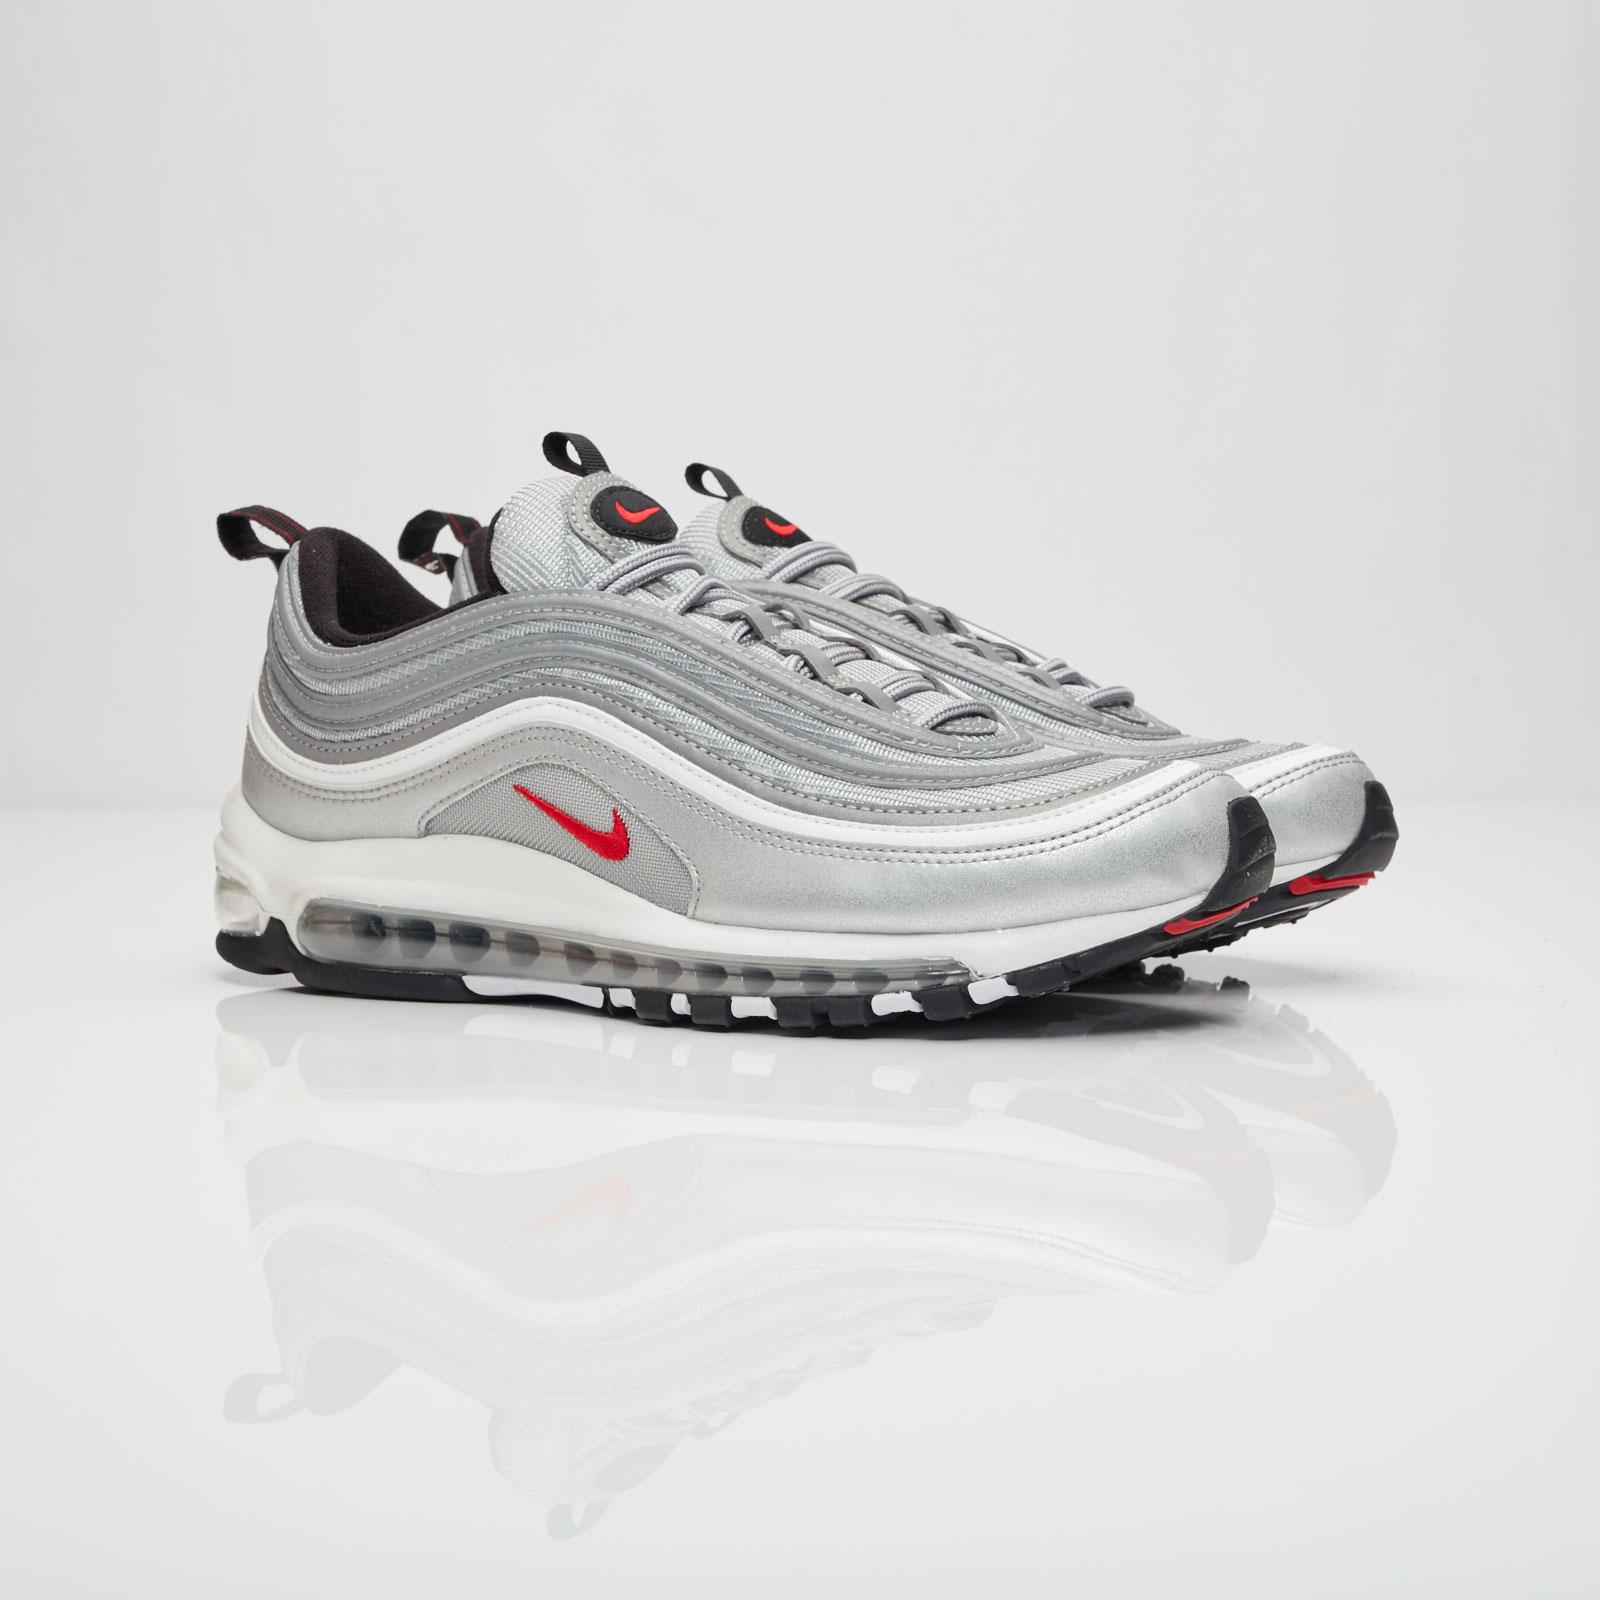 save off a341d ee536 Nike Sportswear Air Max 97 OG QS